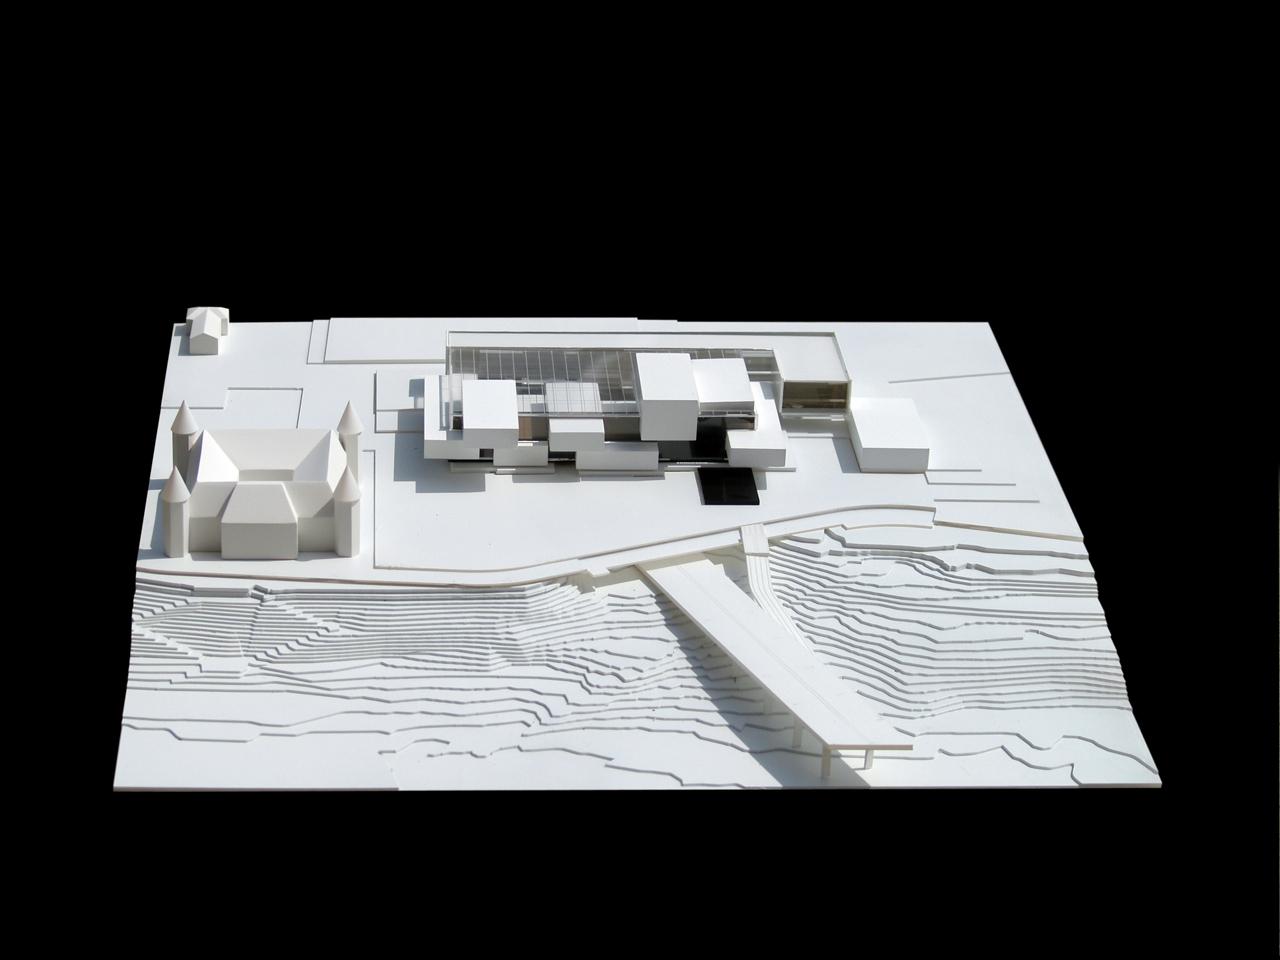 Gallery of museum of polish history proposal zerafa for Studio 11 architecture